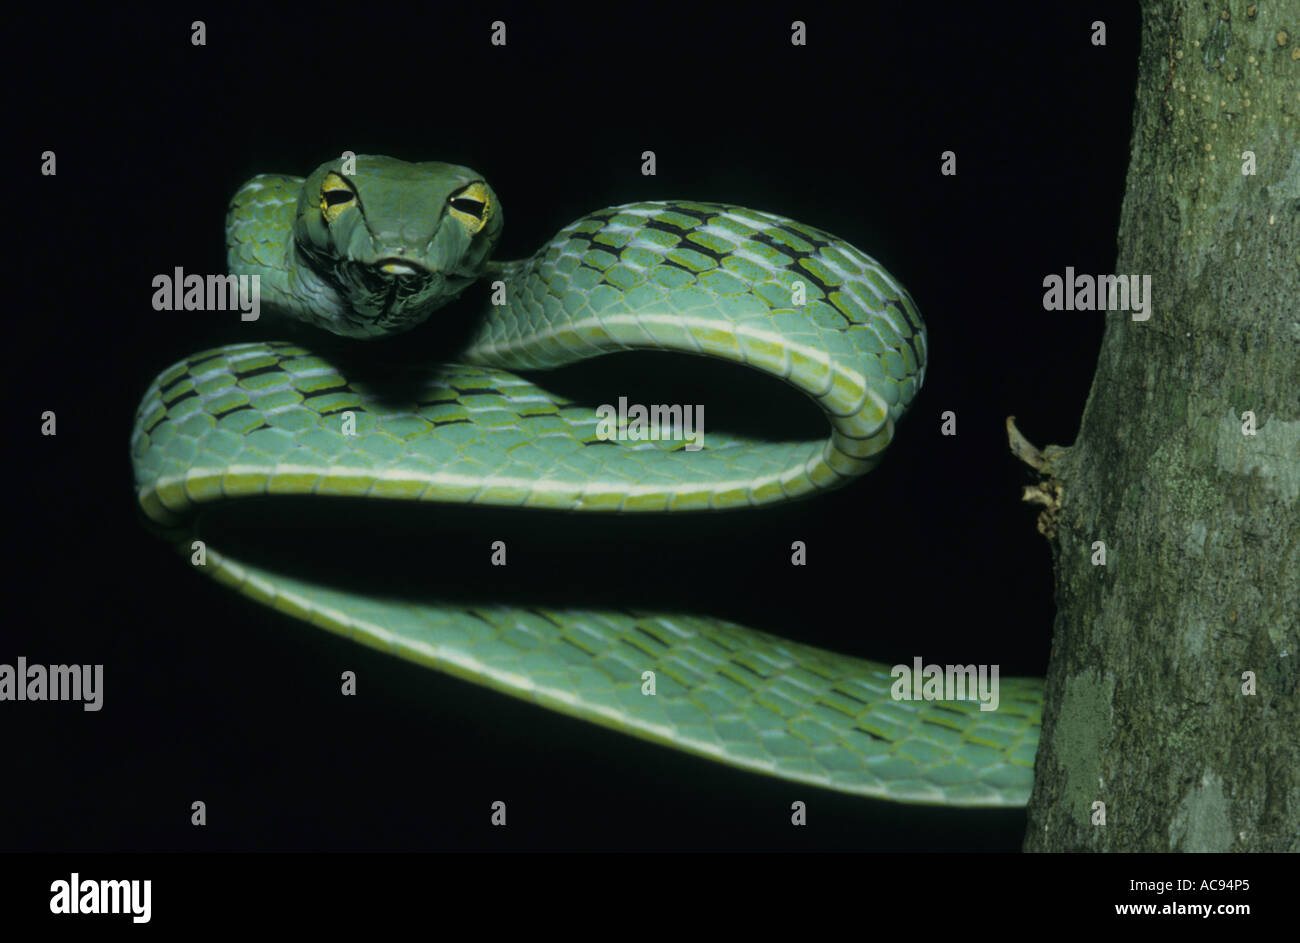 long-nosed tree snake, long-nosed whipsnake, Oriental whipsnake (Ahaetulla prasina), view from front, Indonesia, Sumatra Stock Photo